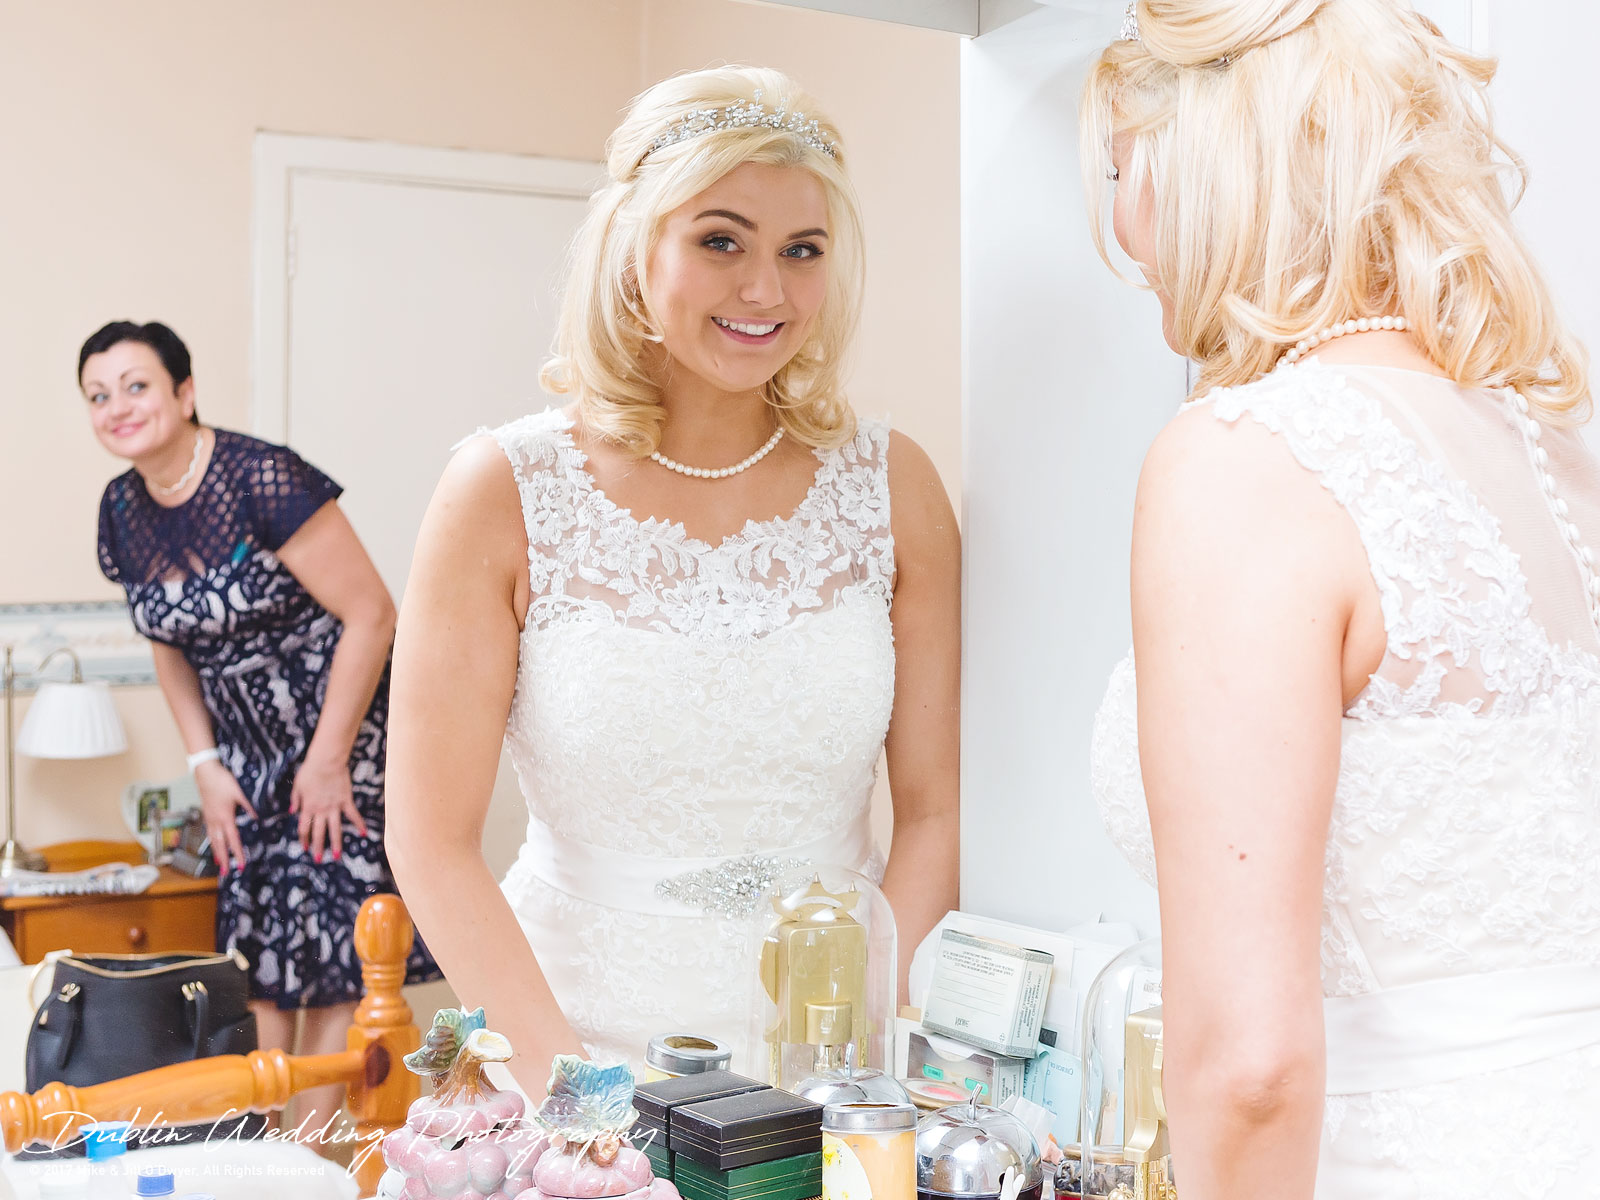 Wedding Photographer in Wicklow Glenview Hotel Bride Prep 03